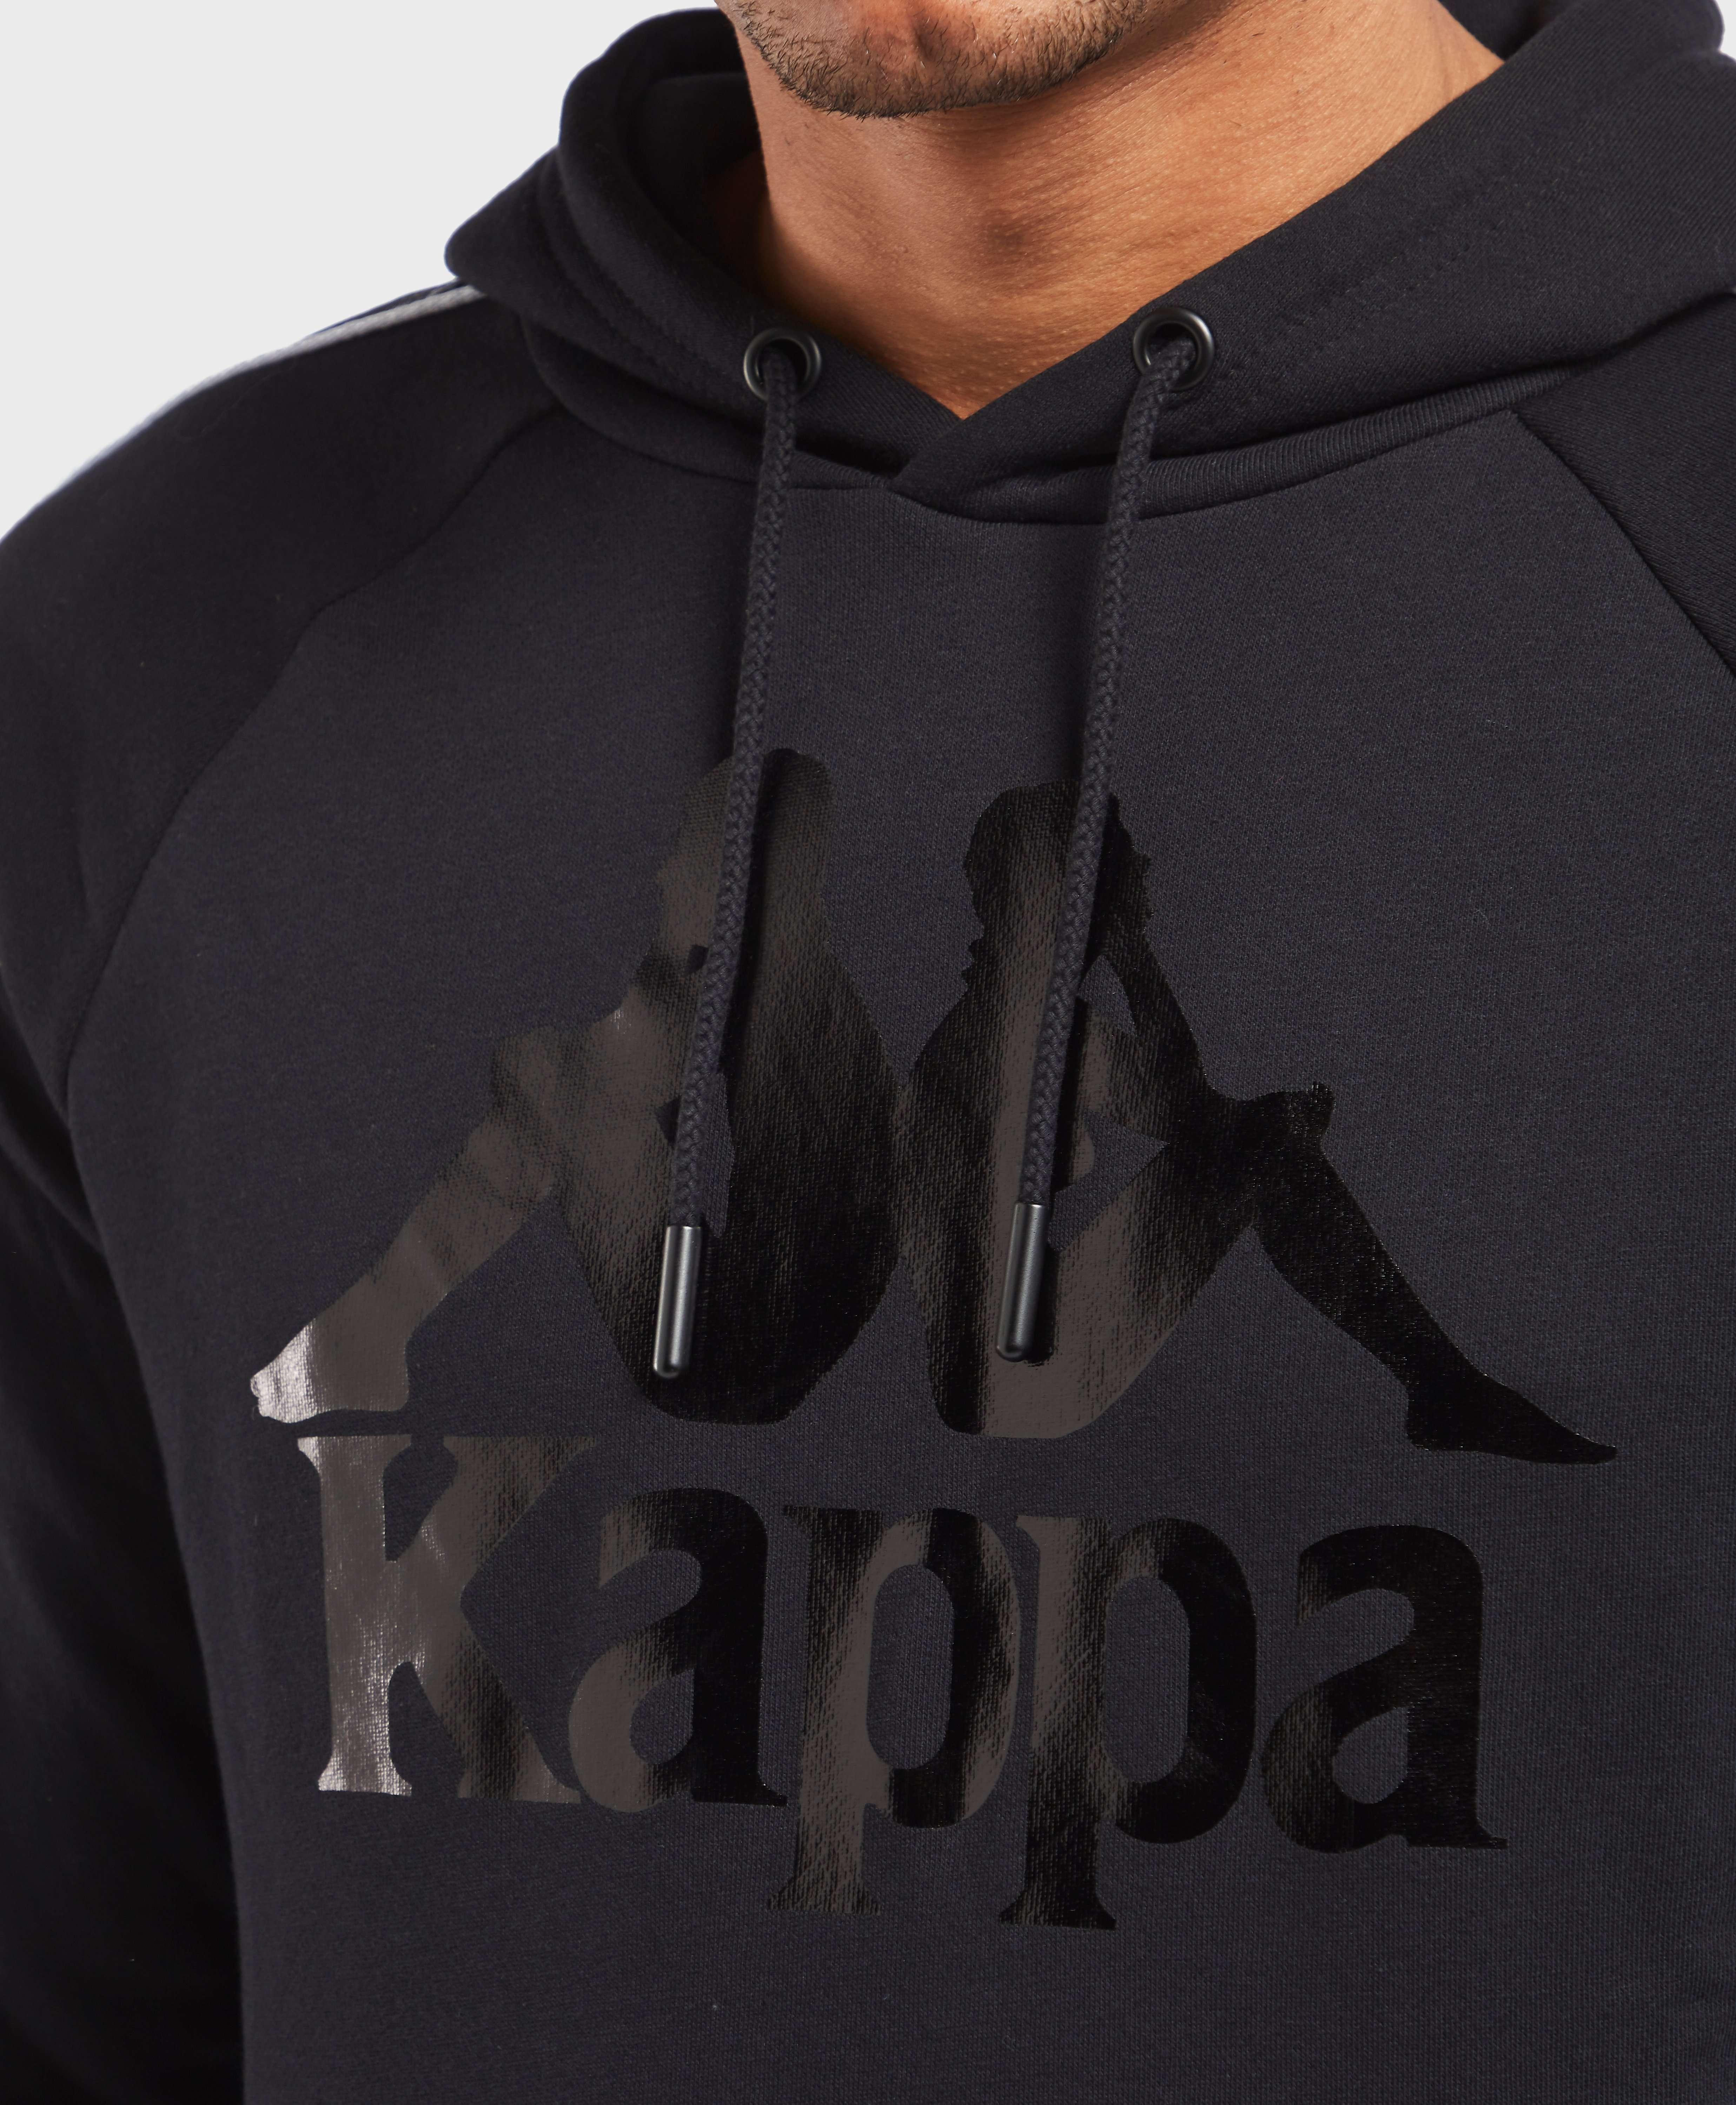 Kappa Authentic Hurtado Overhead Hoodie - Exclusive